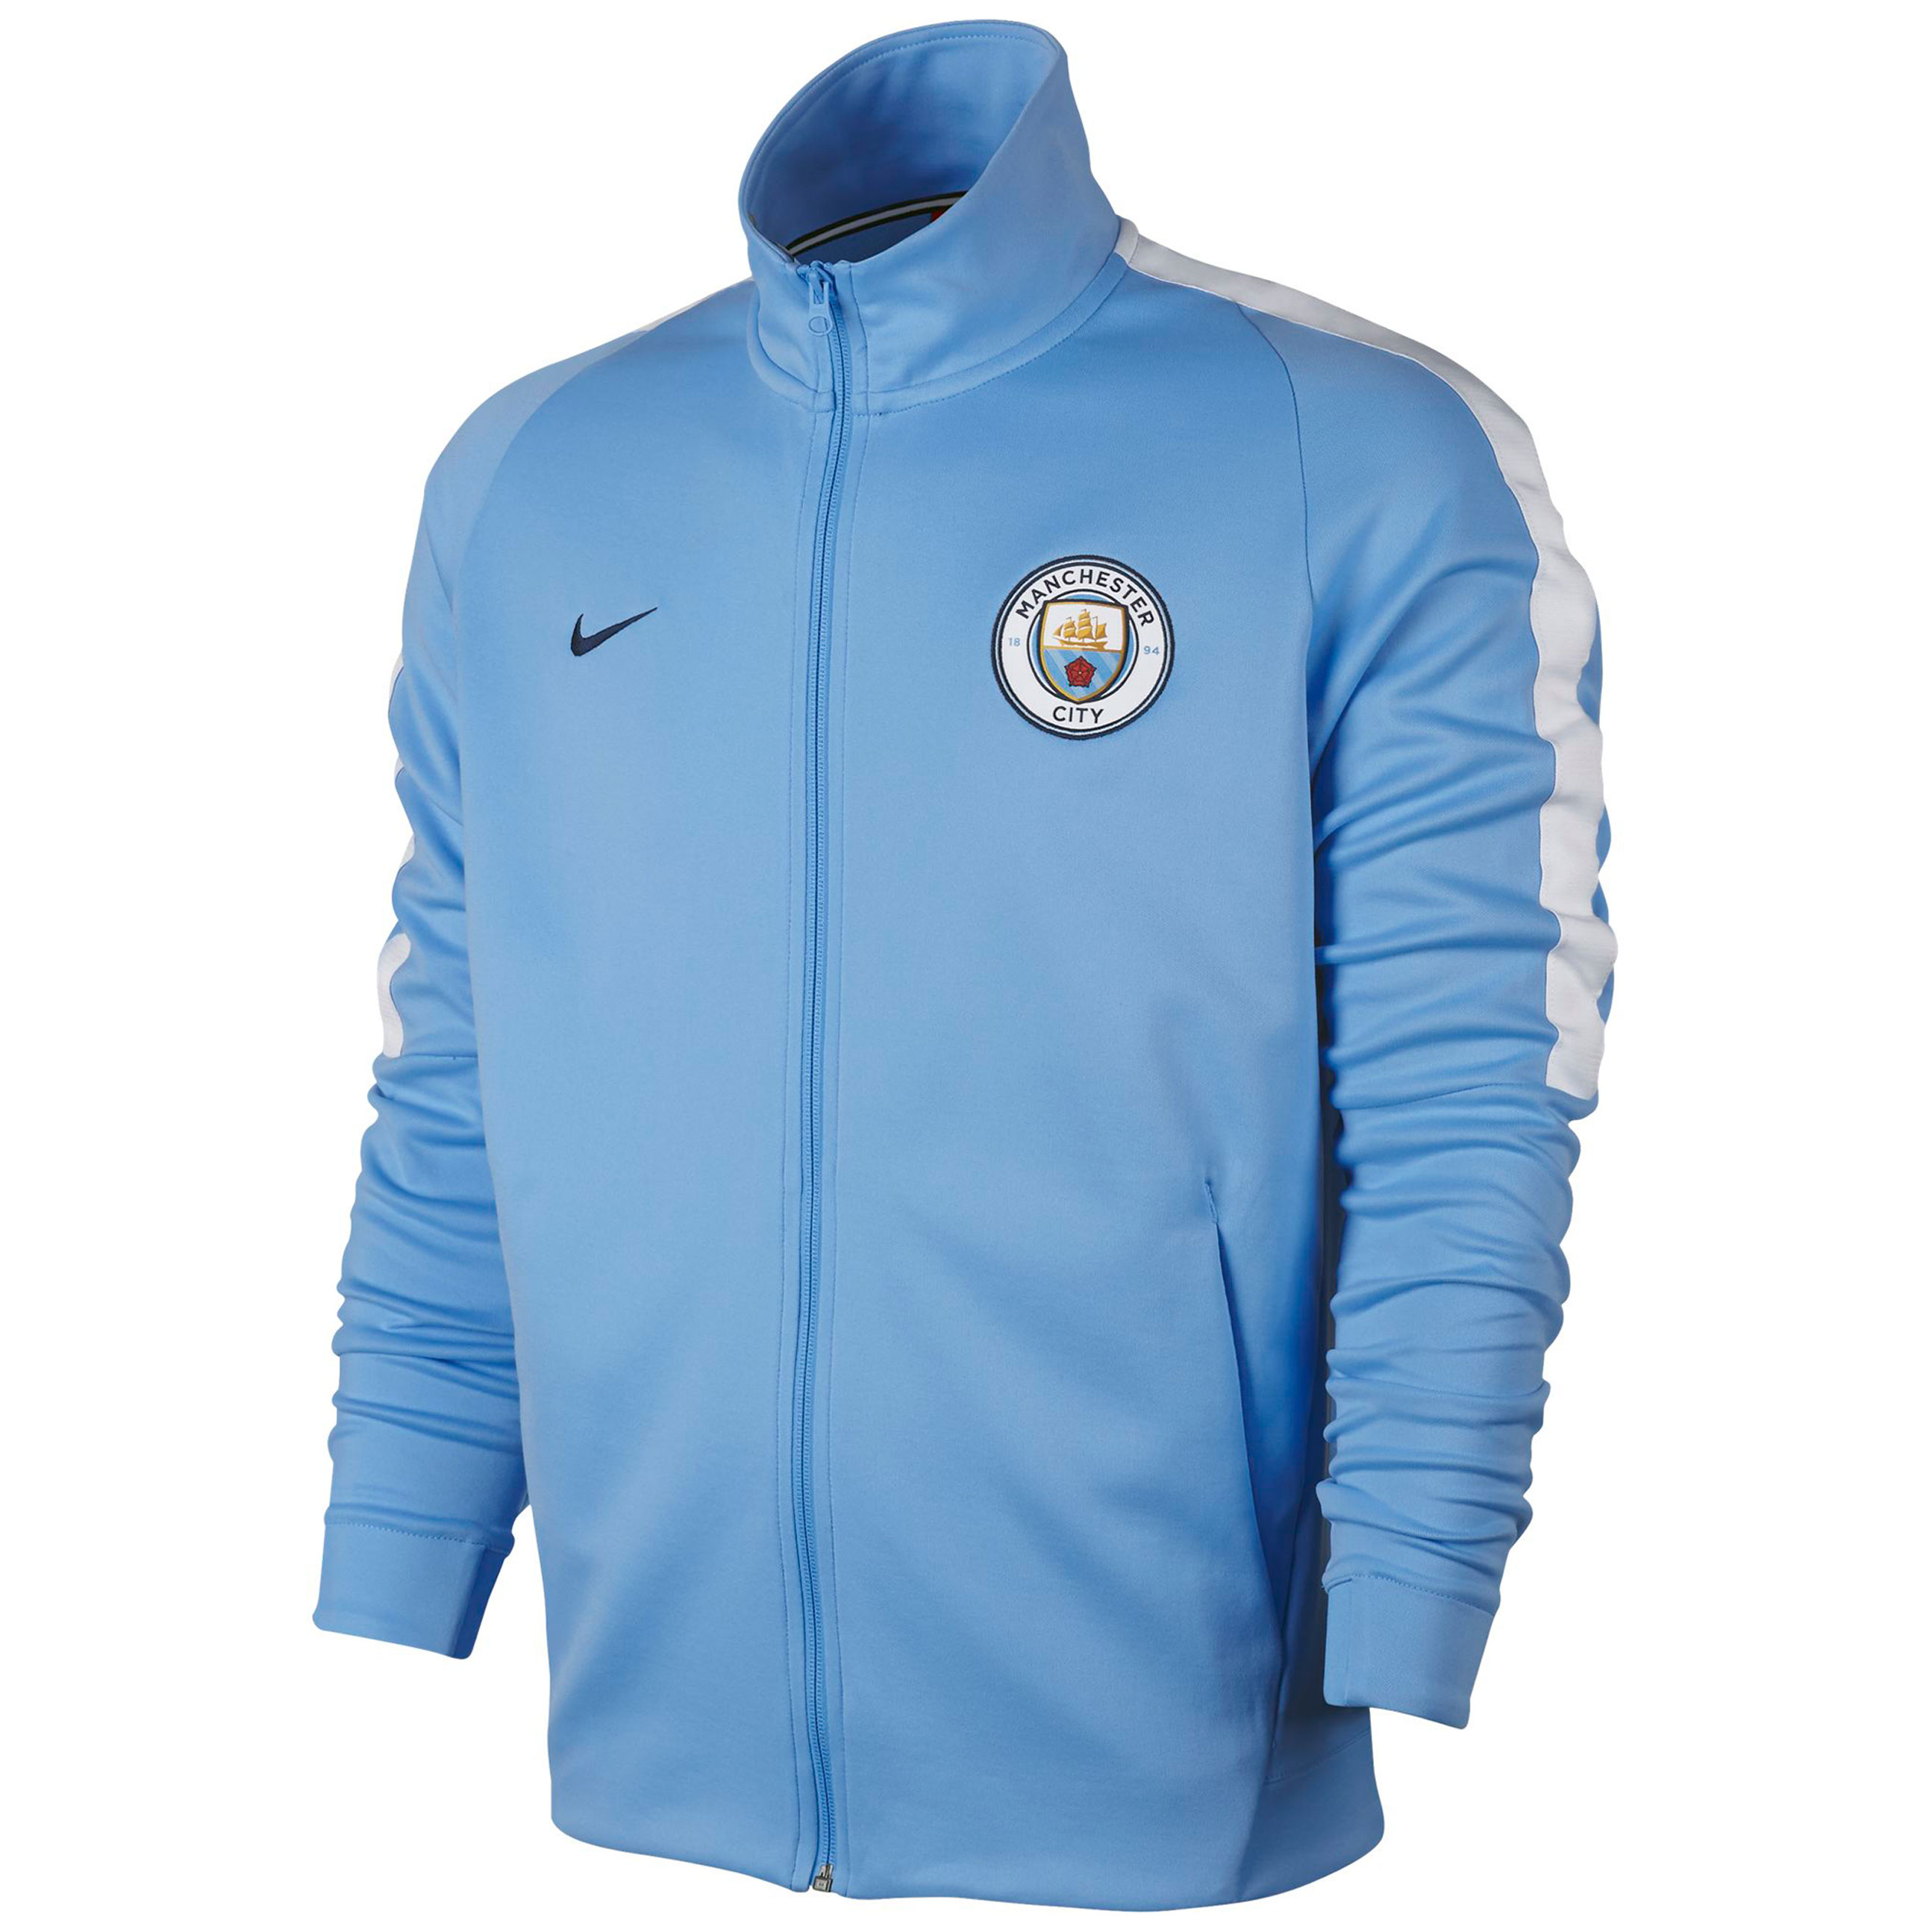 Manchester City Franchise Jacket - Light Blue